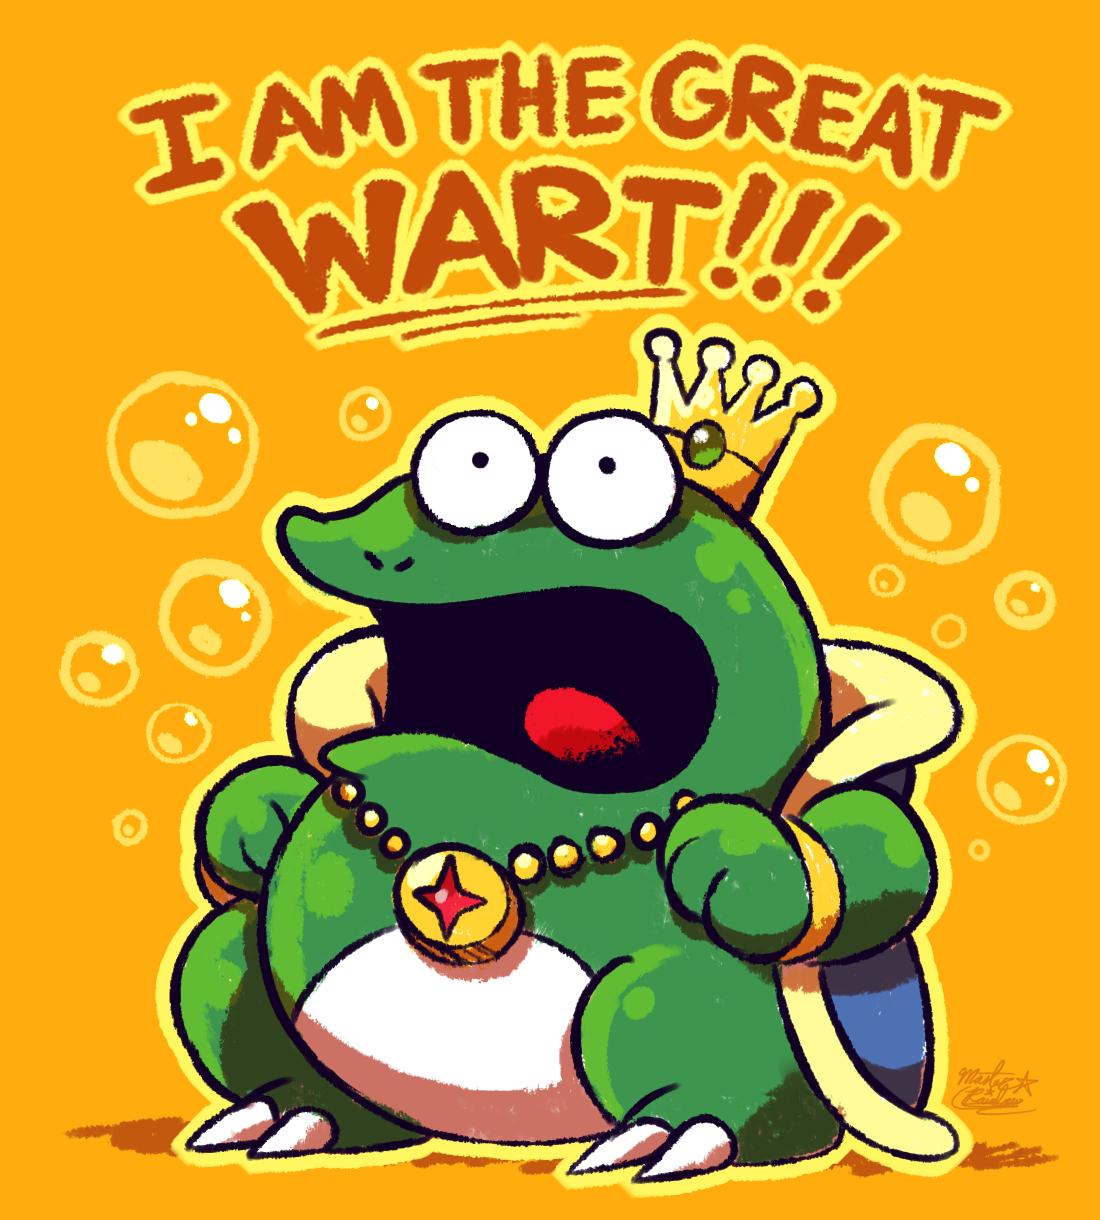 The Great Wart Super Mario Bros 2 By Mast3r Rainb0w On Deviantart